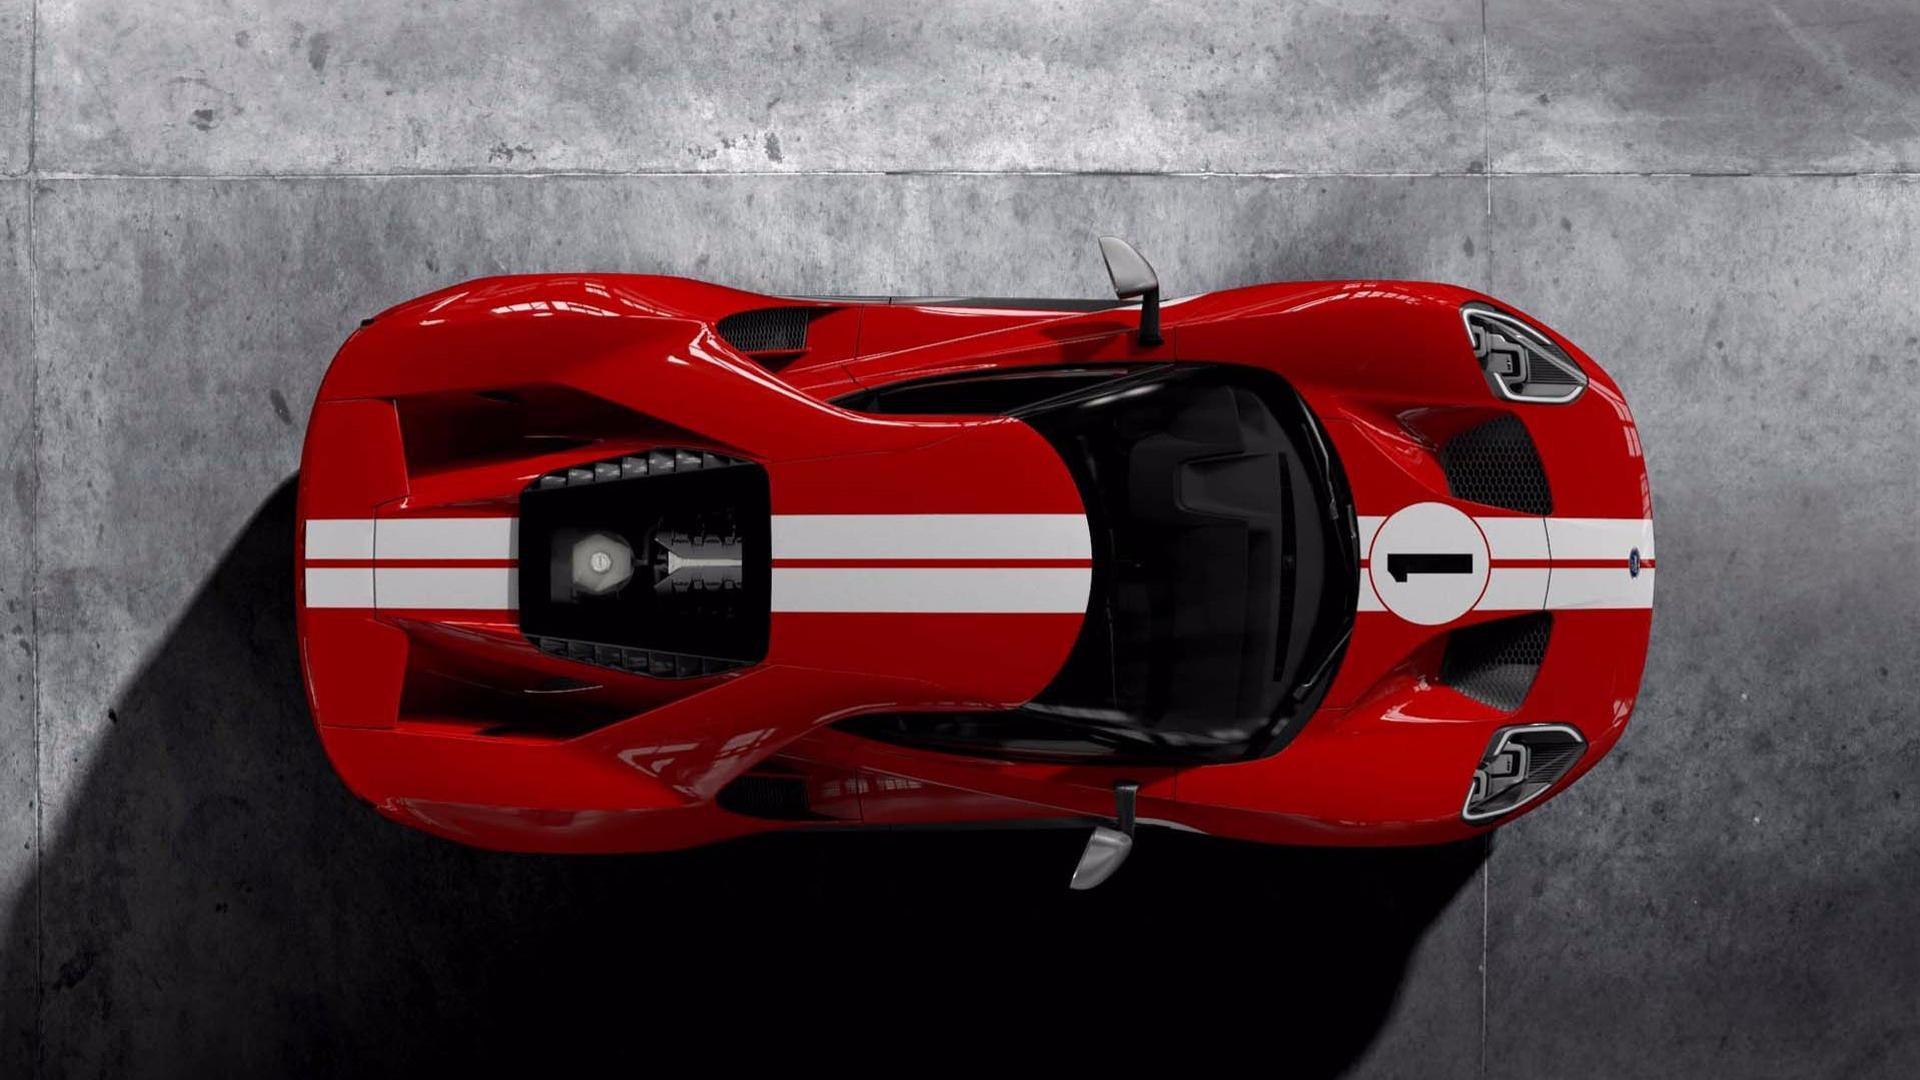 ford-devoile-la-superbe-gt-67-heritage-edition-tres-limitee-402-7.jpg